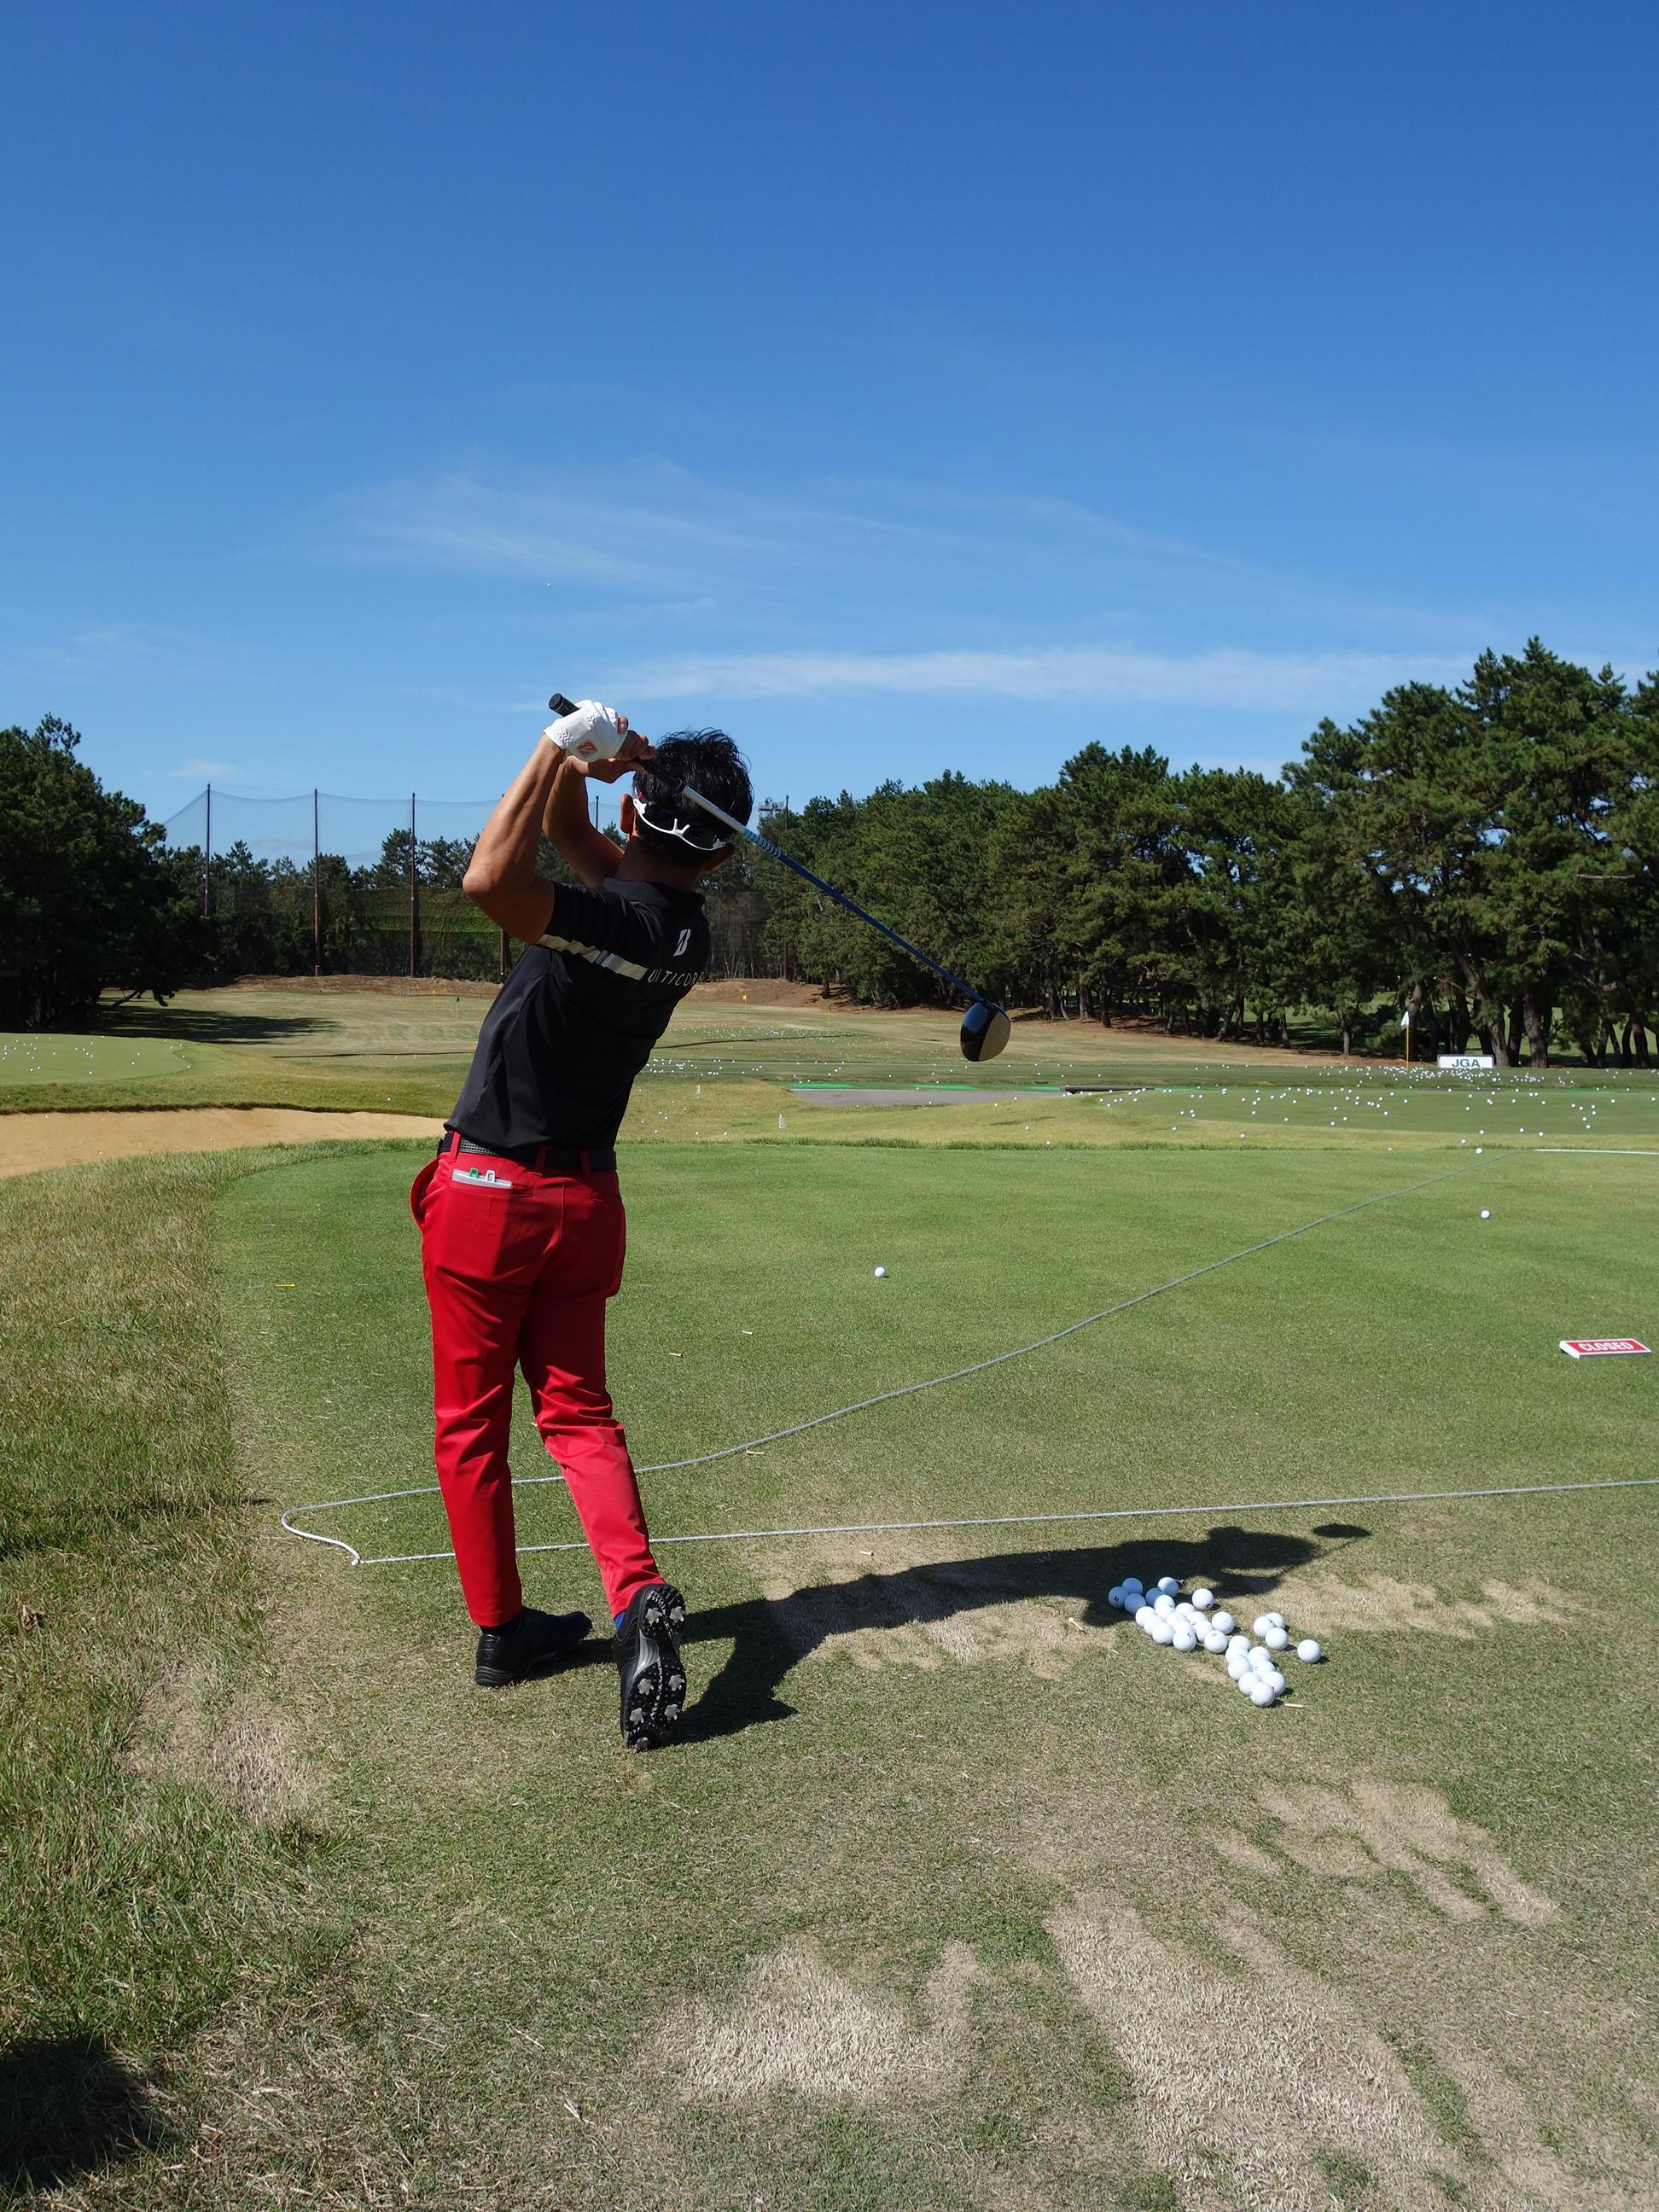 https://www.bs-golf.com/pro/dbe575c8af65ddbd5632714f7aab089ff341e8f8.JPG